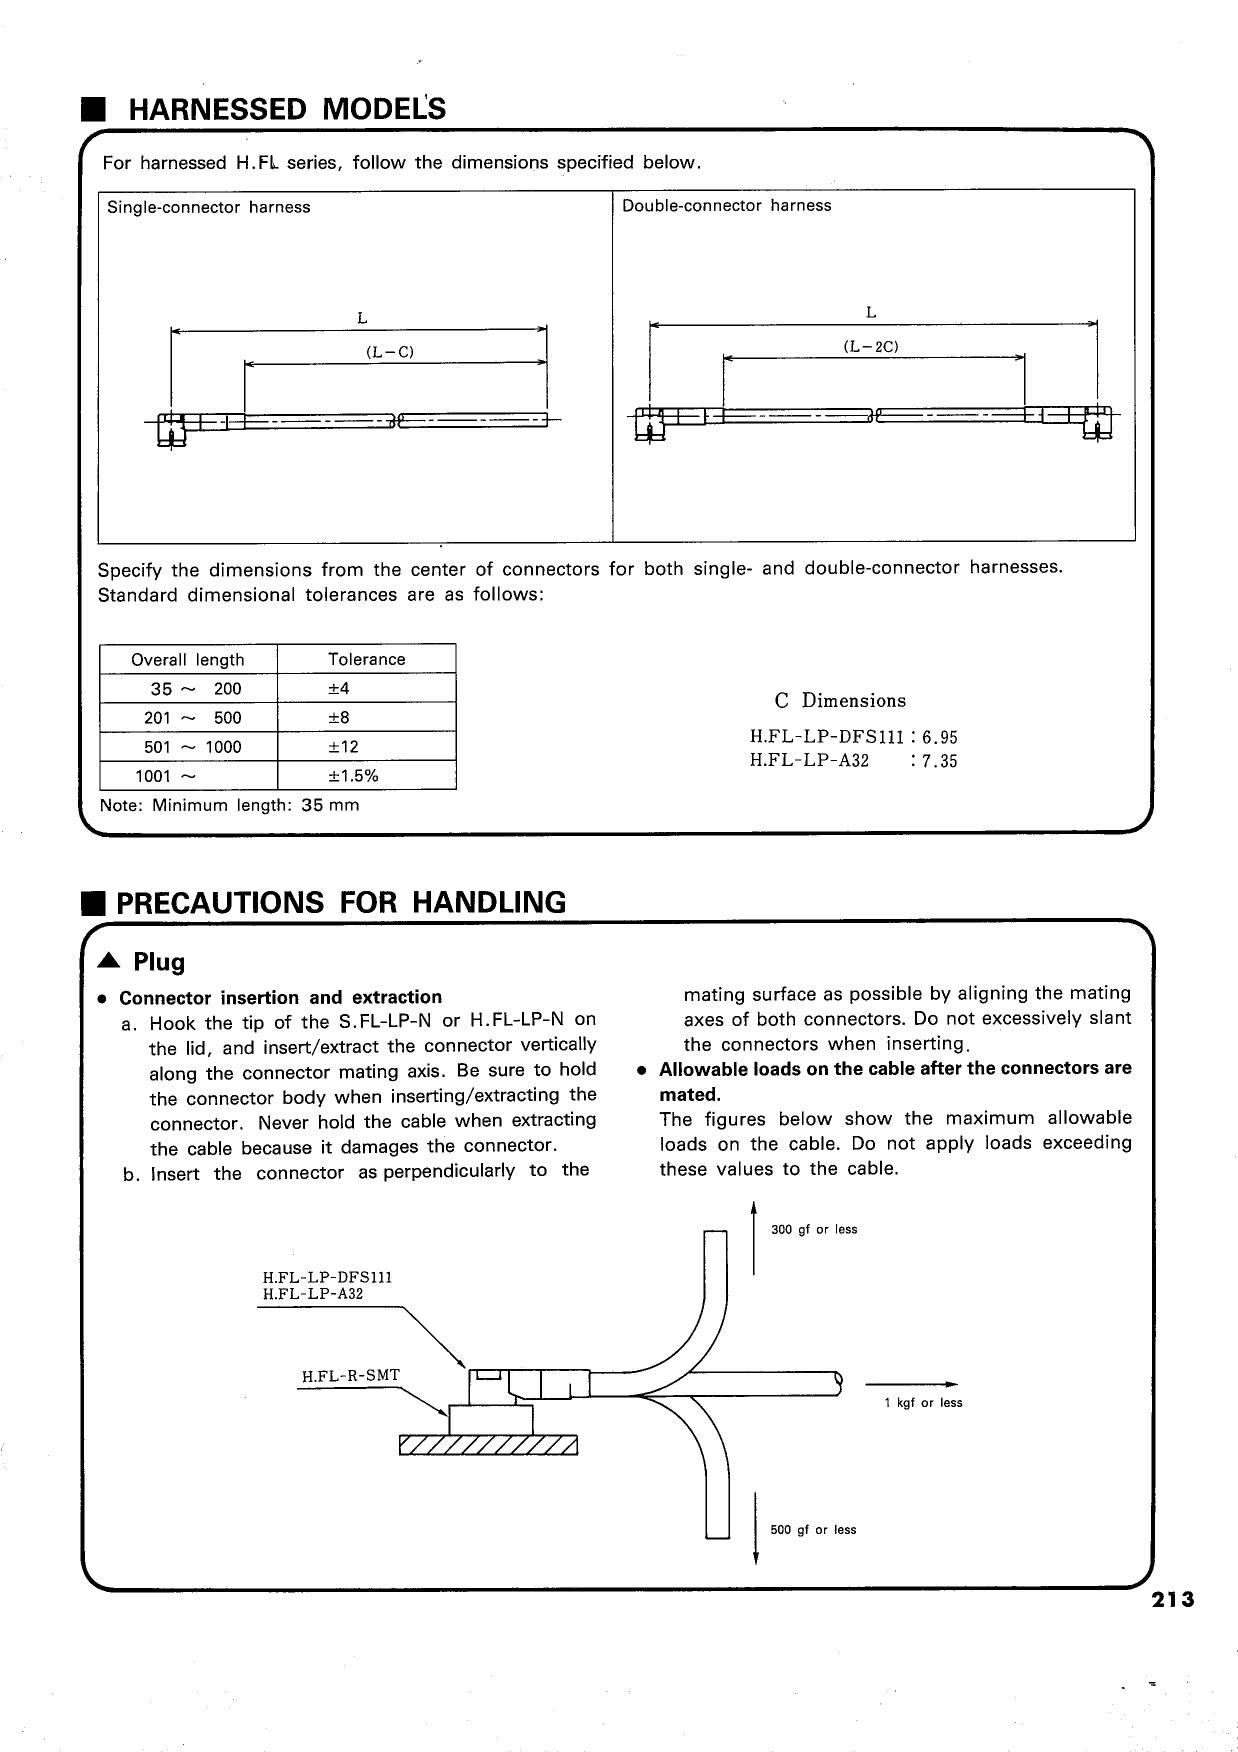 H.FL-R-SMT pdf